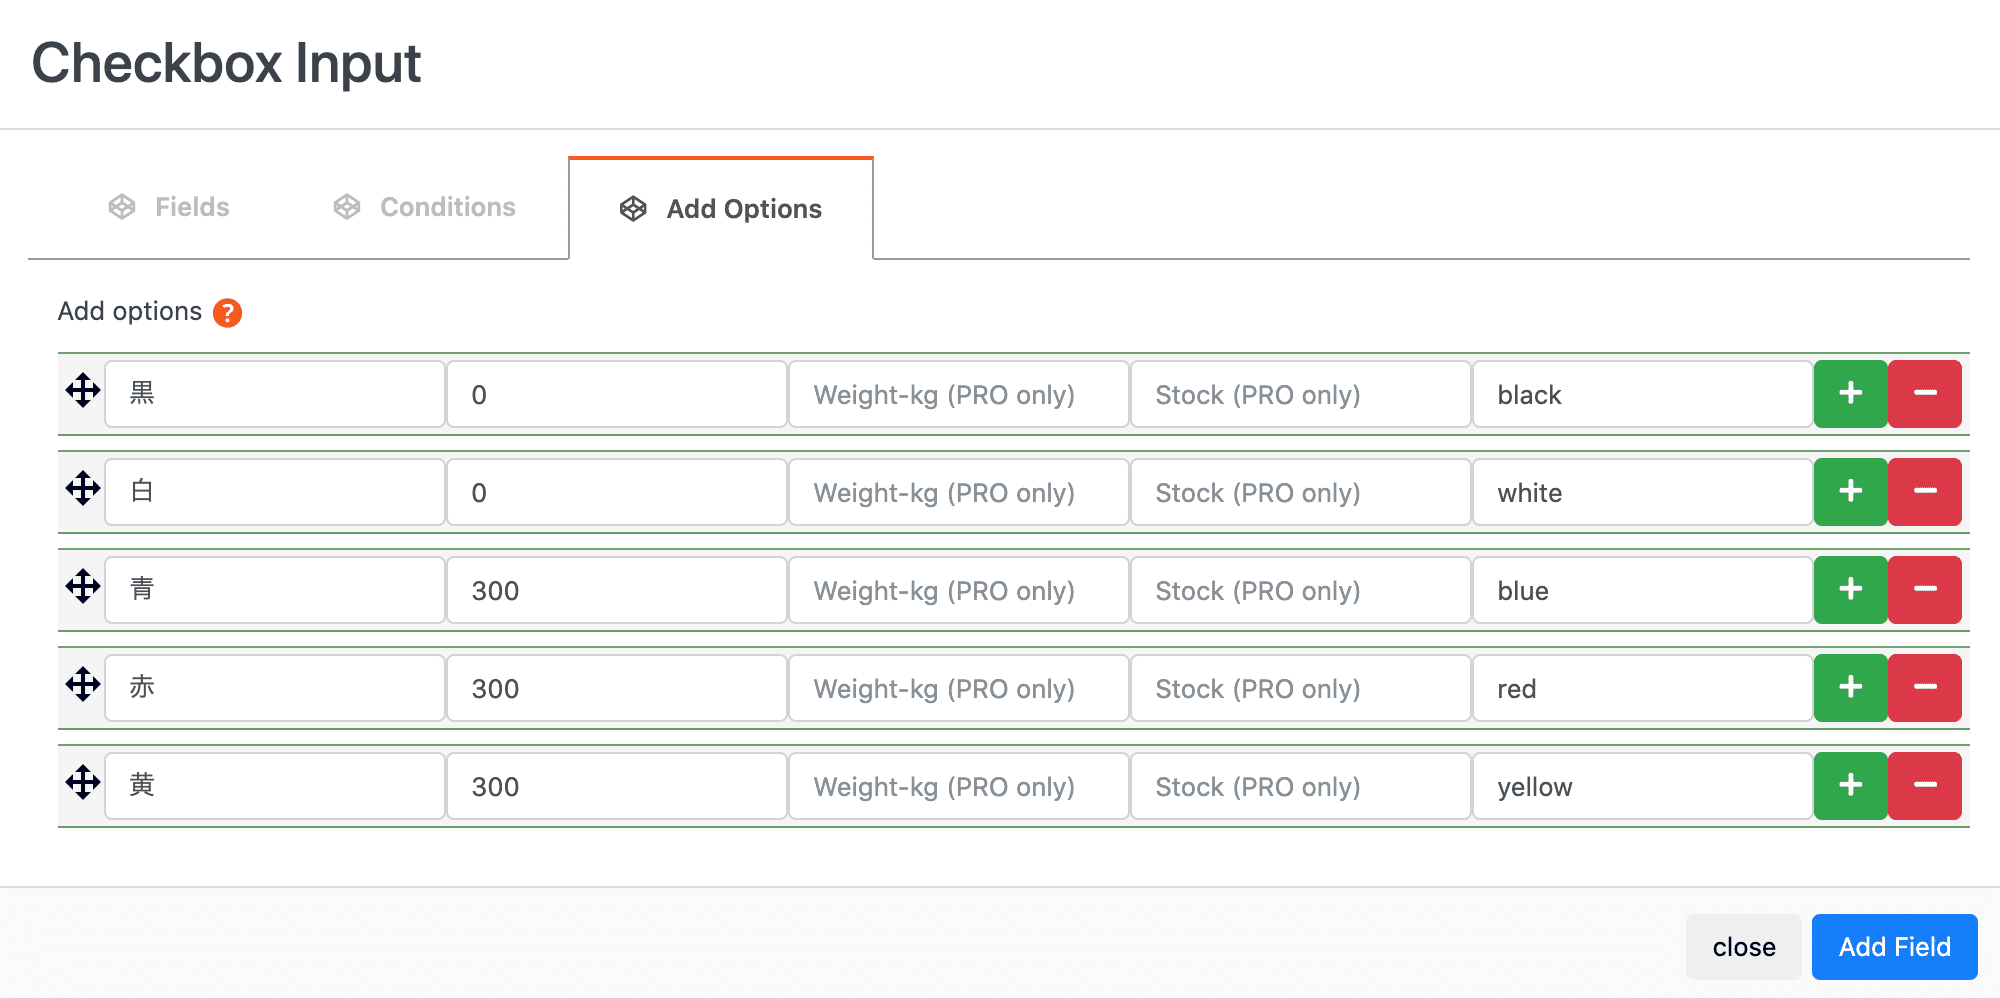 Checkbox InputのAdd Options